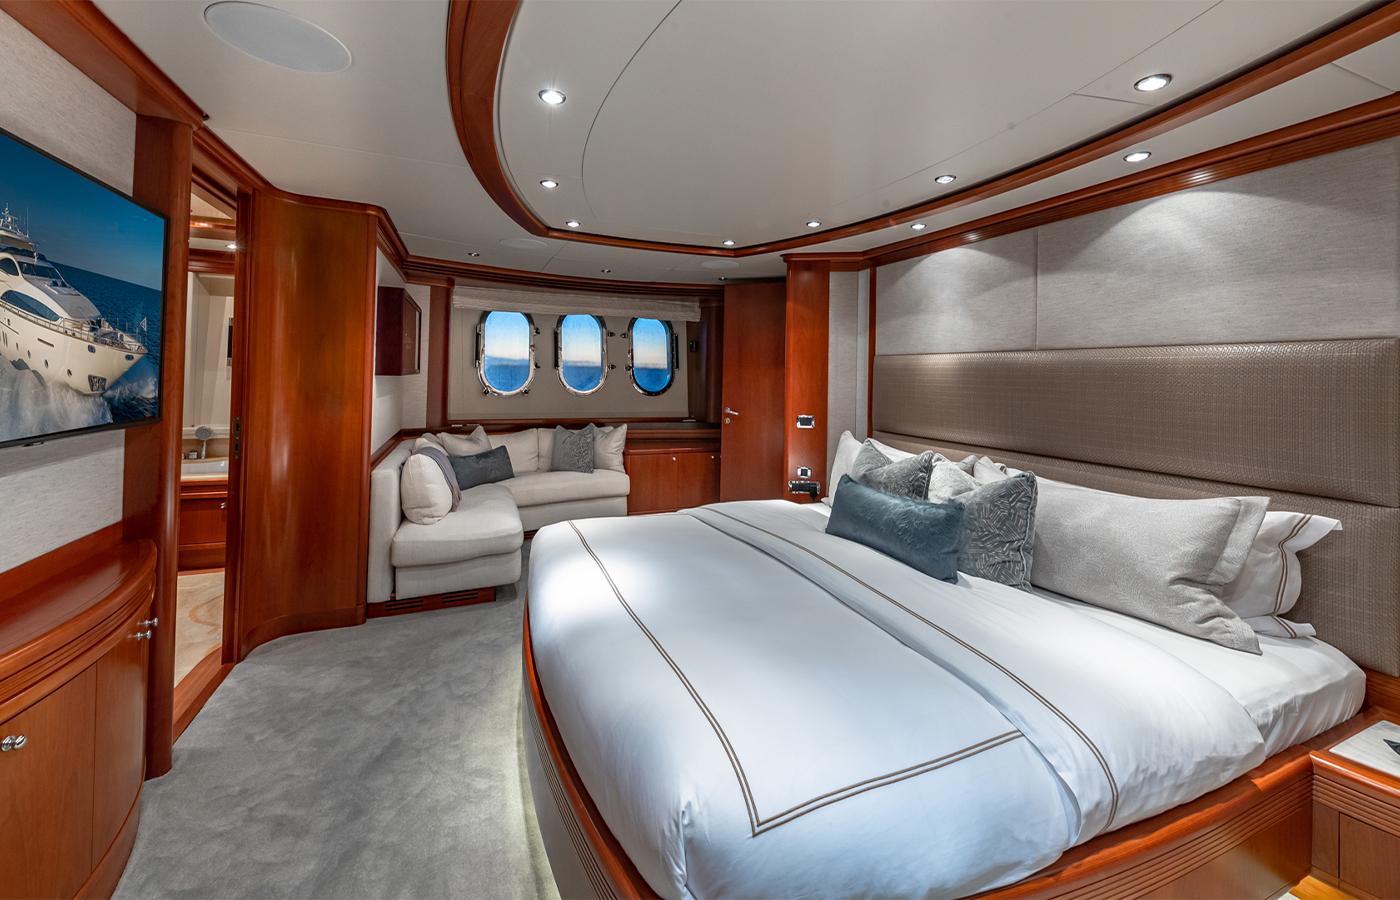 Luxury Yacht Charter: SWEET EMOCEAN | 116' Azimut 2009/2019 - photo 6